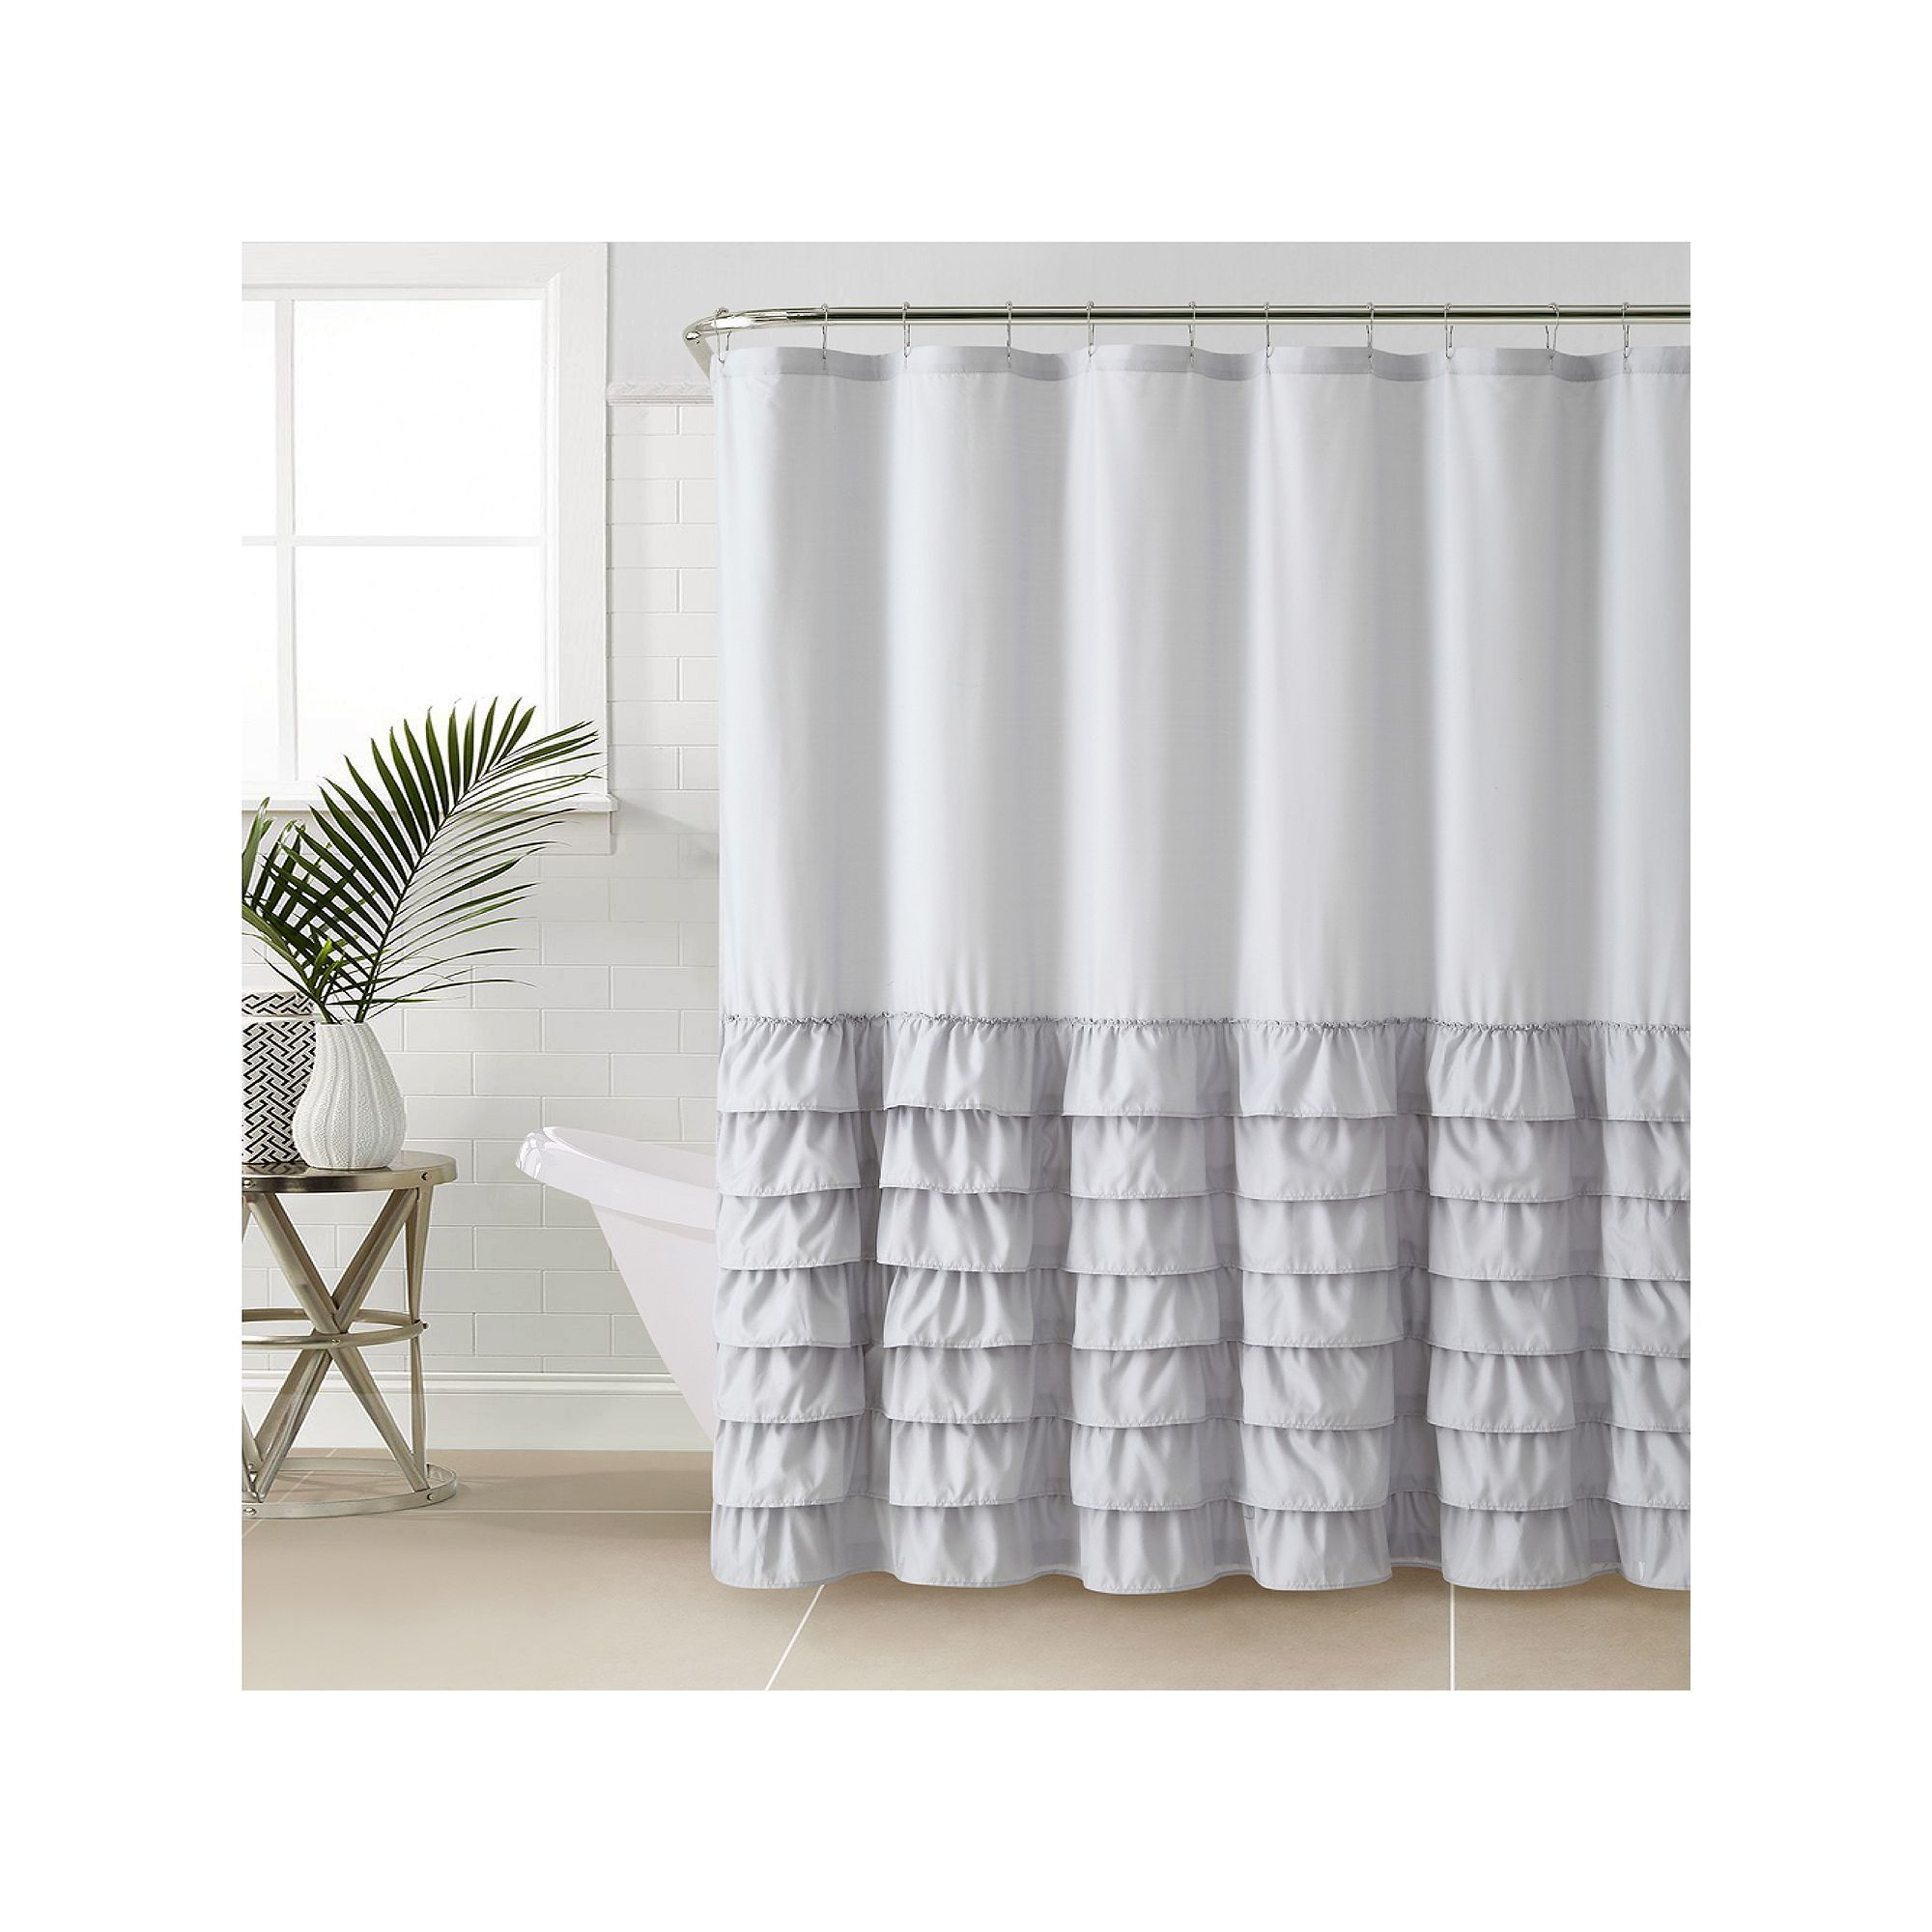 Vcny Melanie Ruffle Shower Curtain, Grey   Products   Pinterest ...